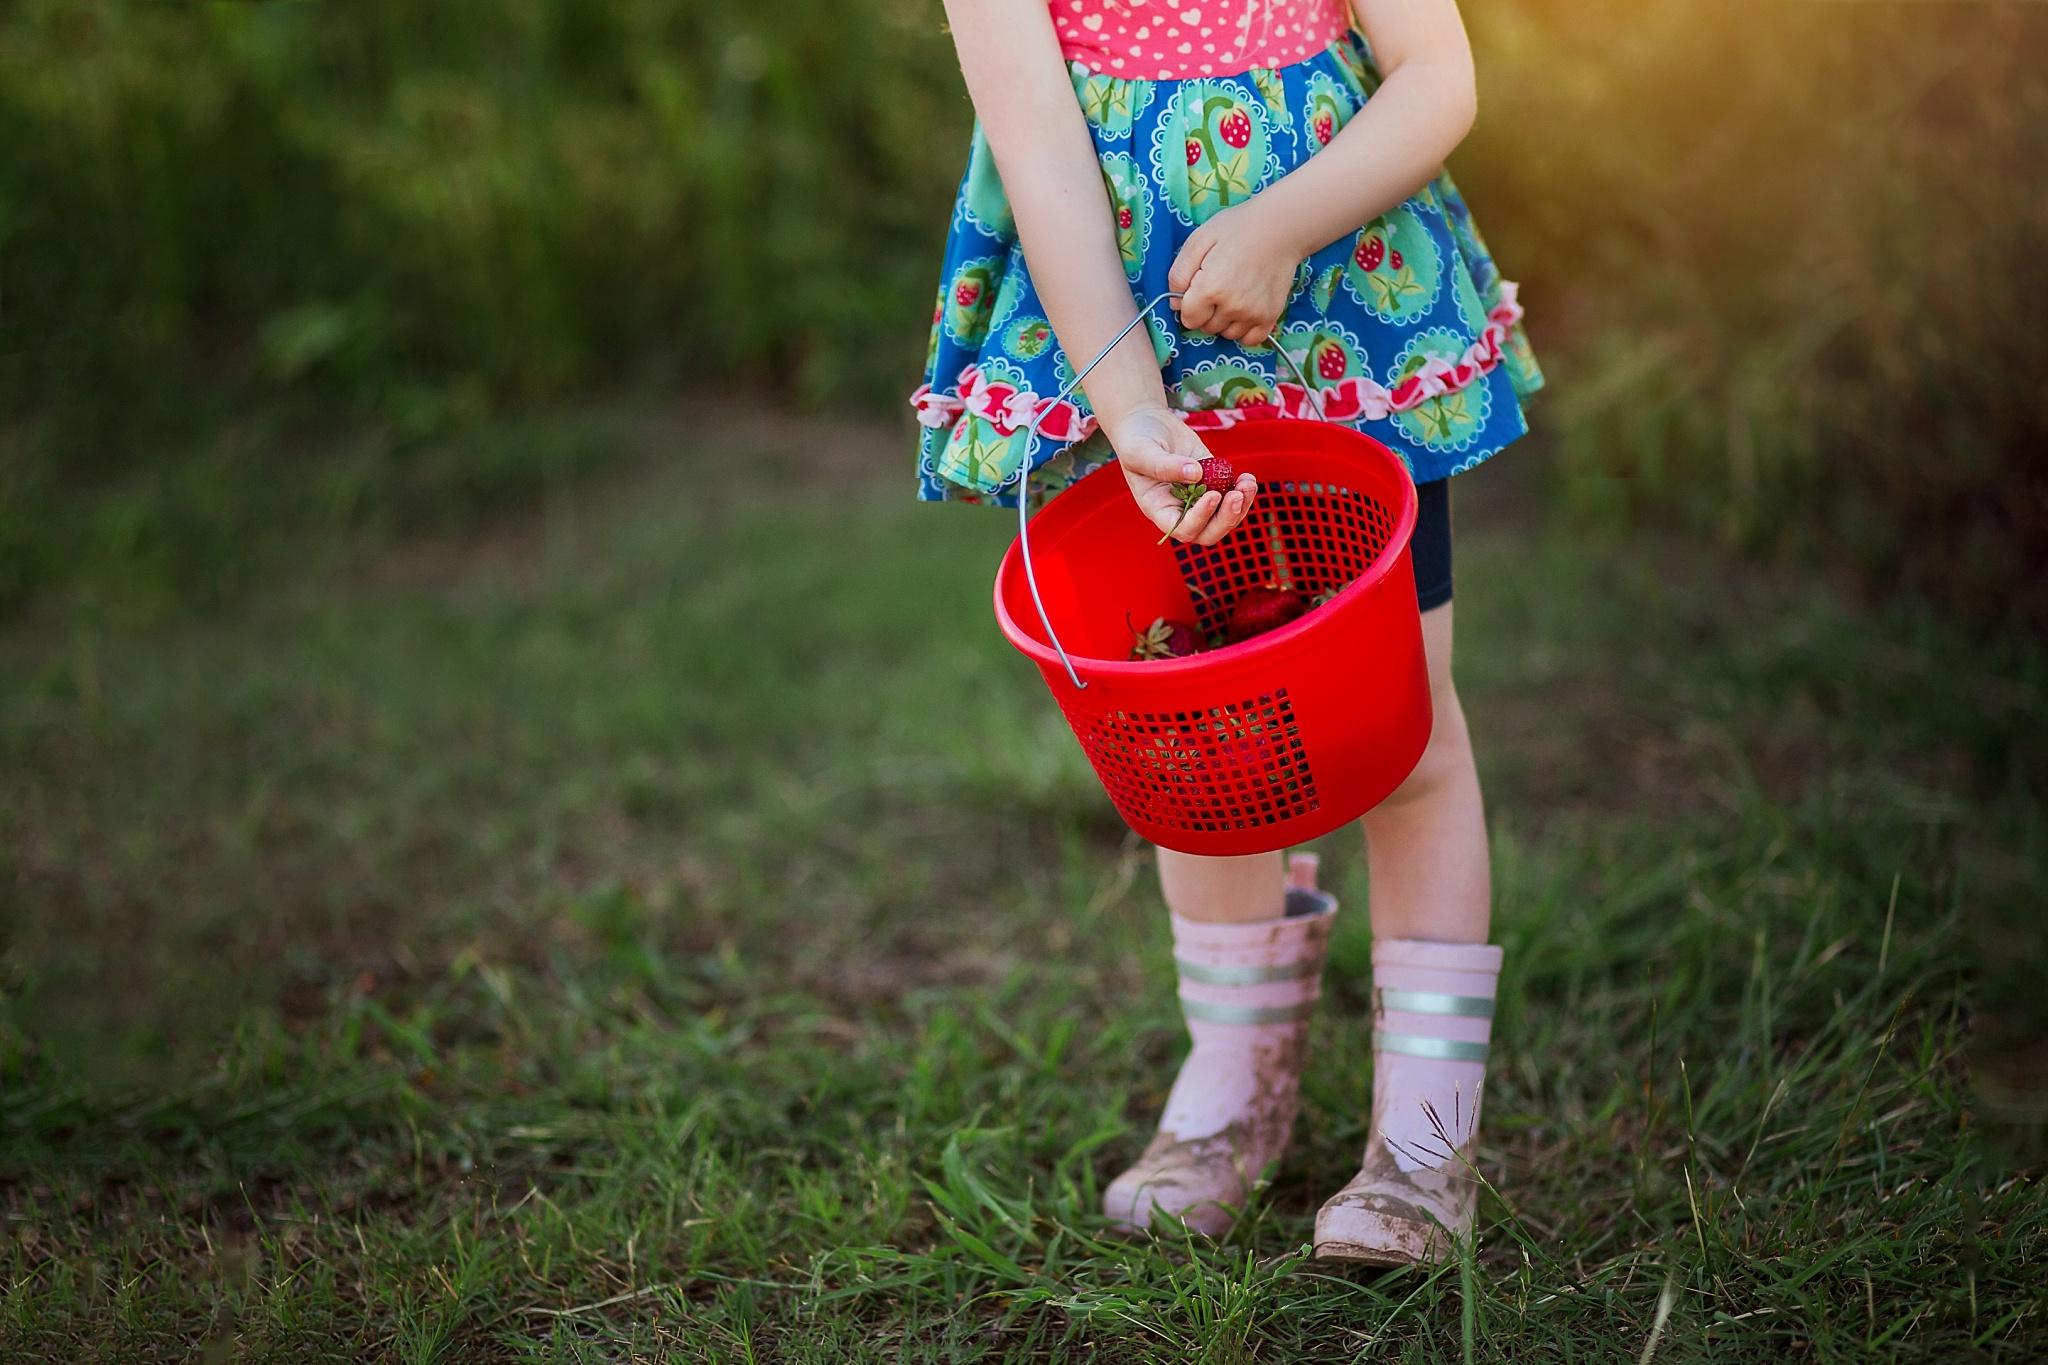 04Strawberry Farm_Libby Grohmann.jpg